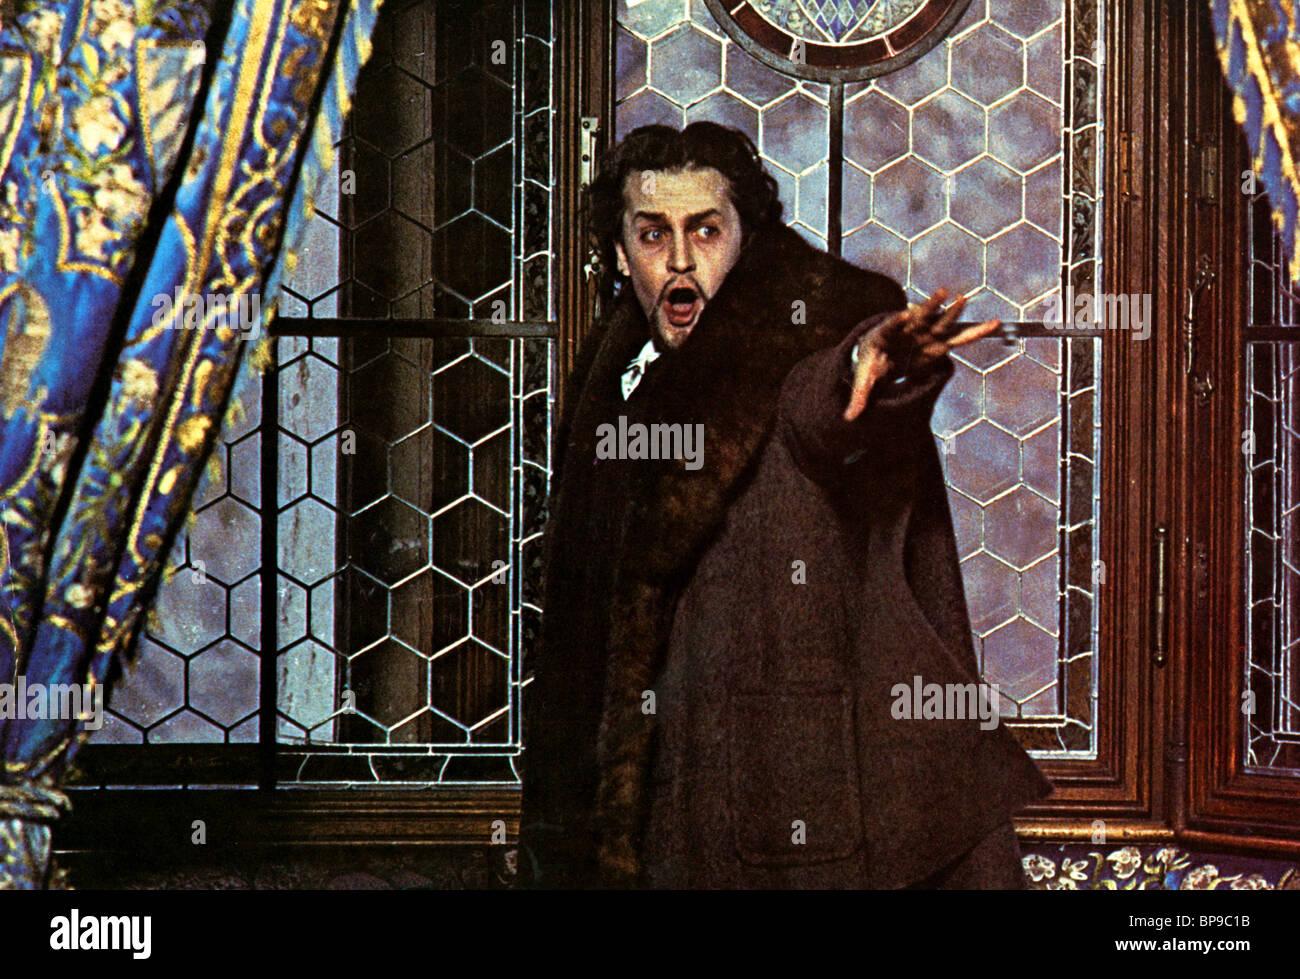 HELMUT BERGER LUDWIG (1972) - Stock Image